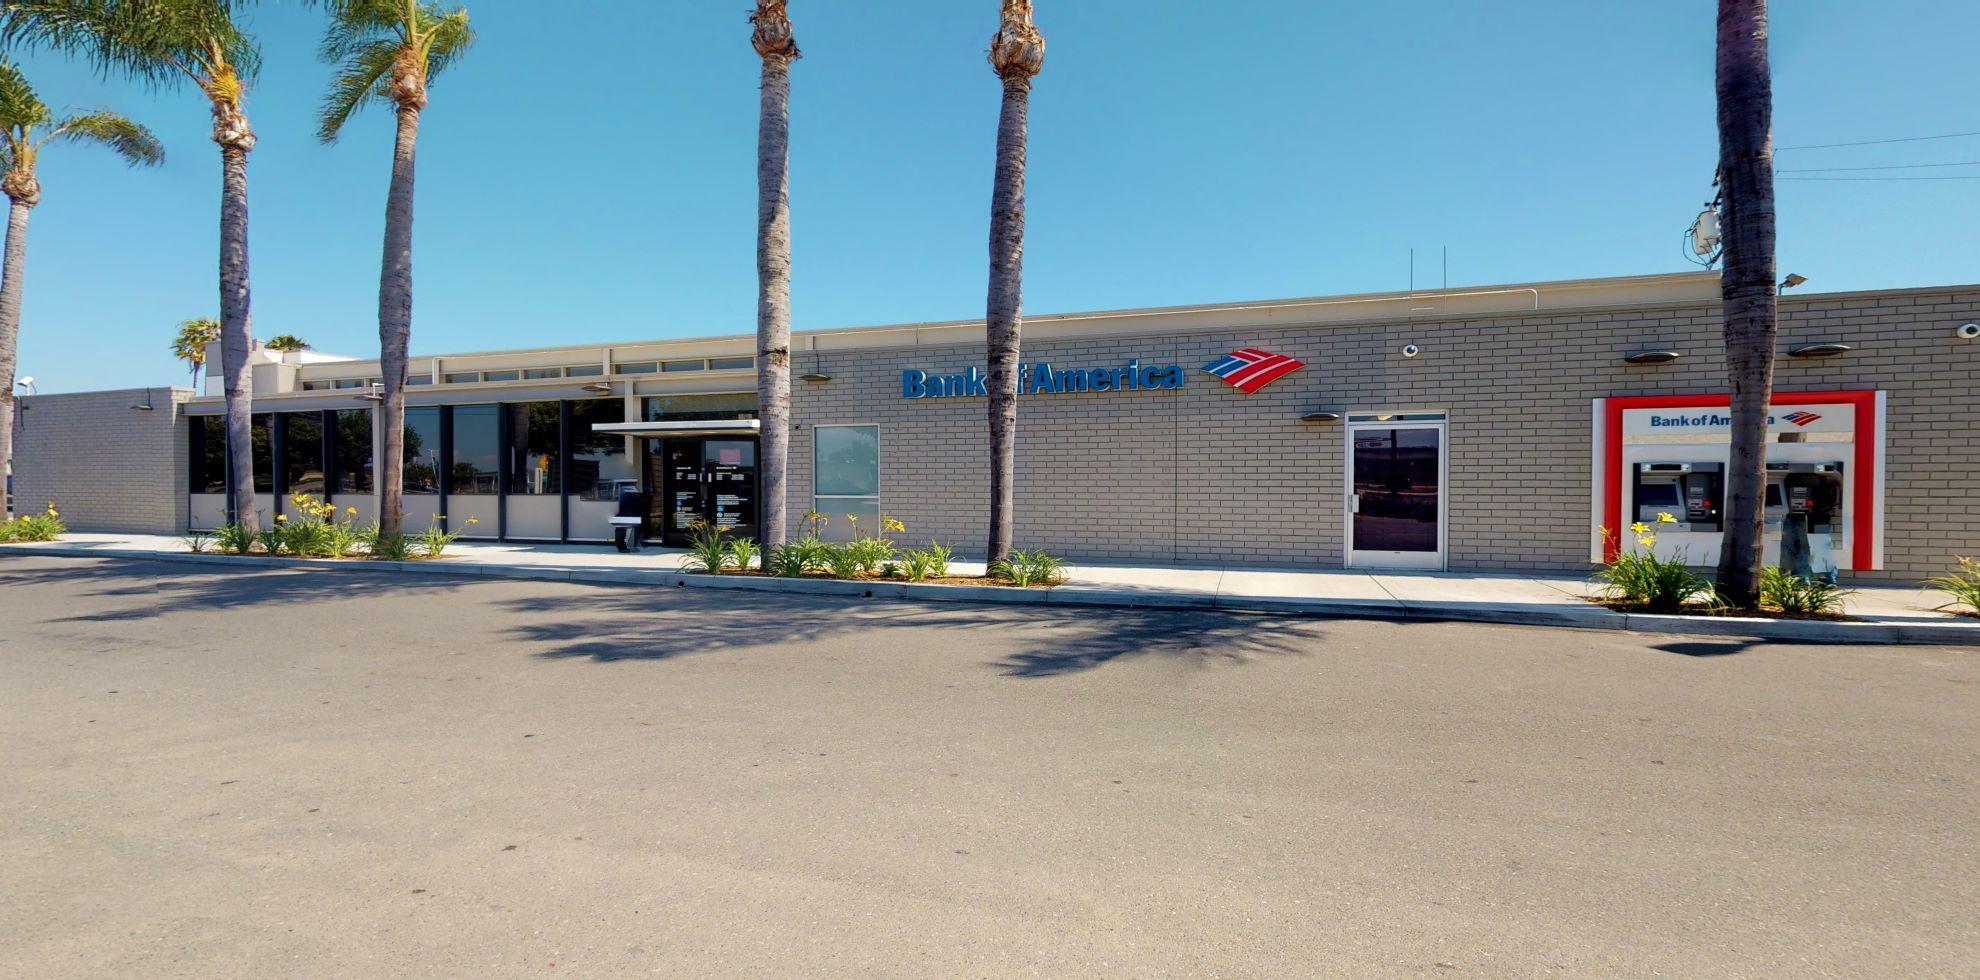 Bank of America financial center with drive-thru ATM | 5812 Edinger Ave, Huntington Beach, CA 92649